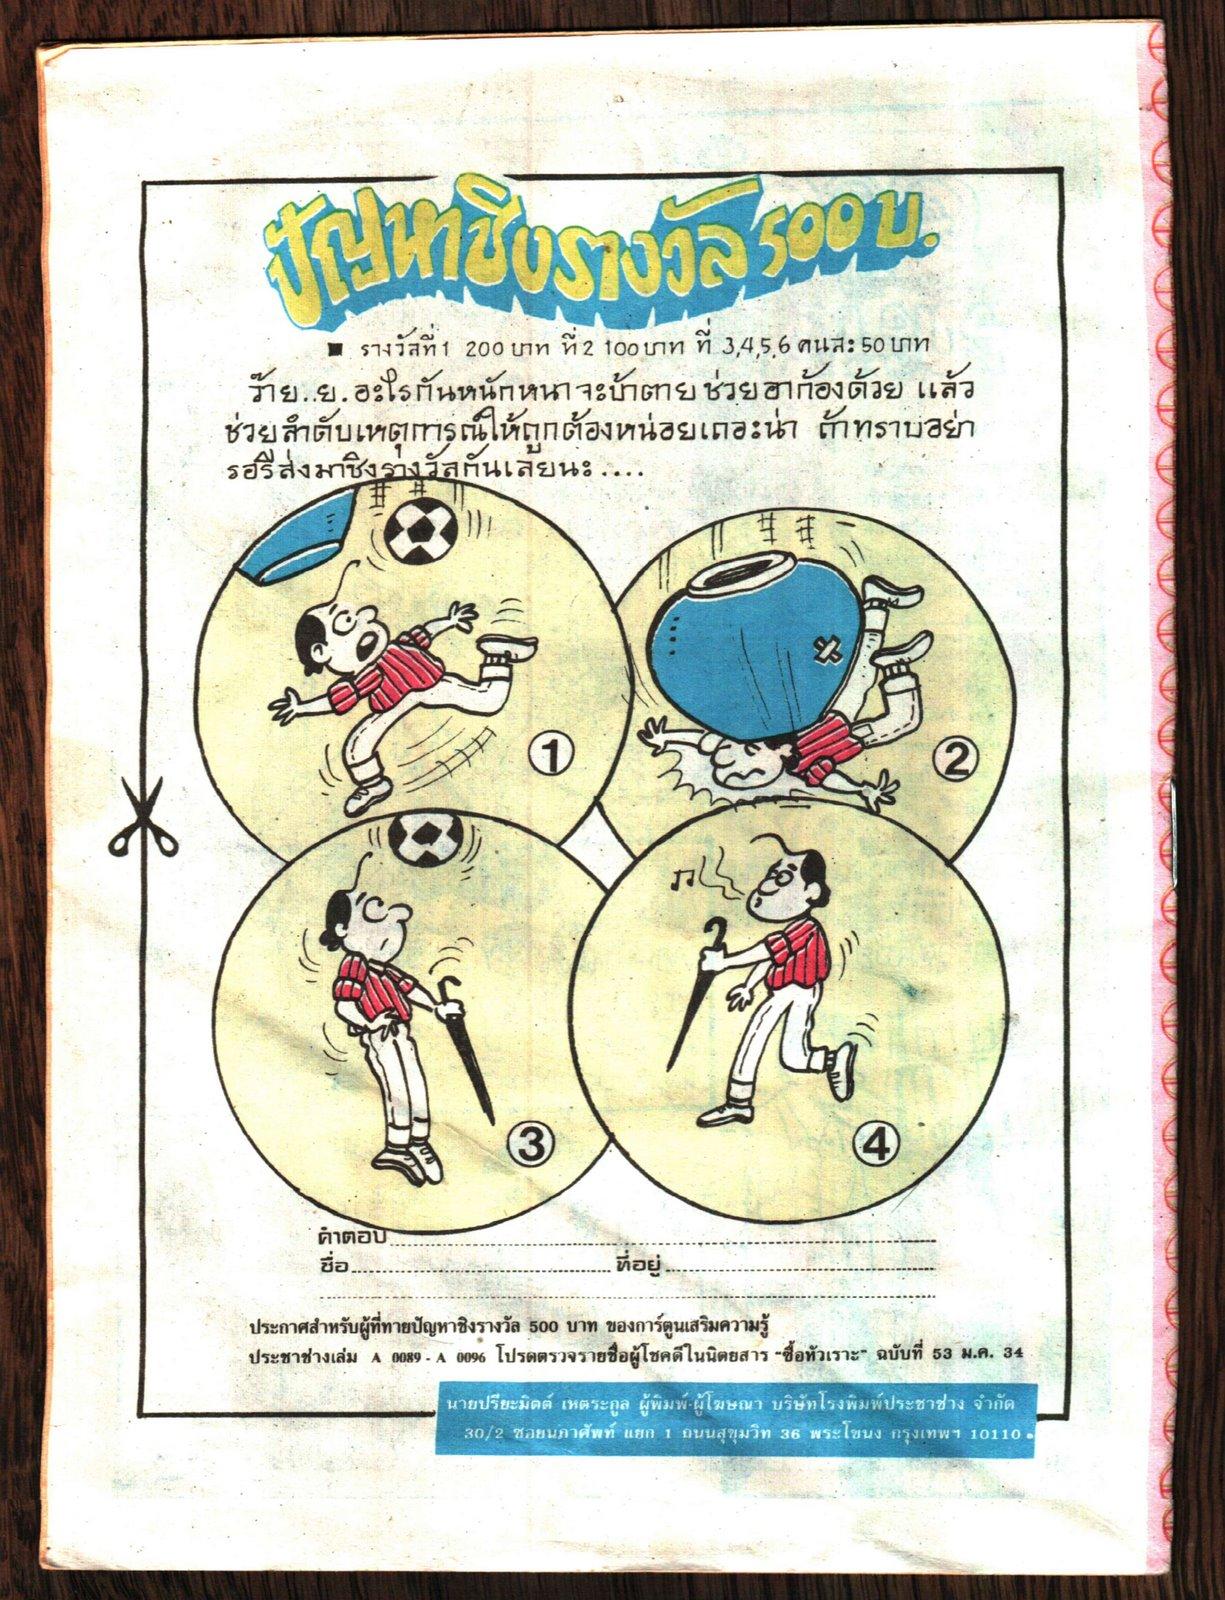 cambodian sadism kids comic - 12 back cover